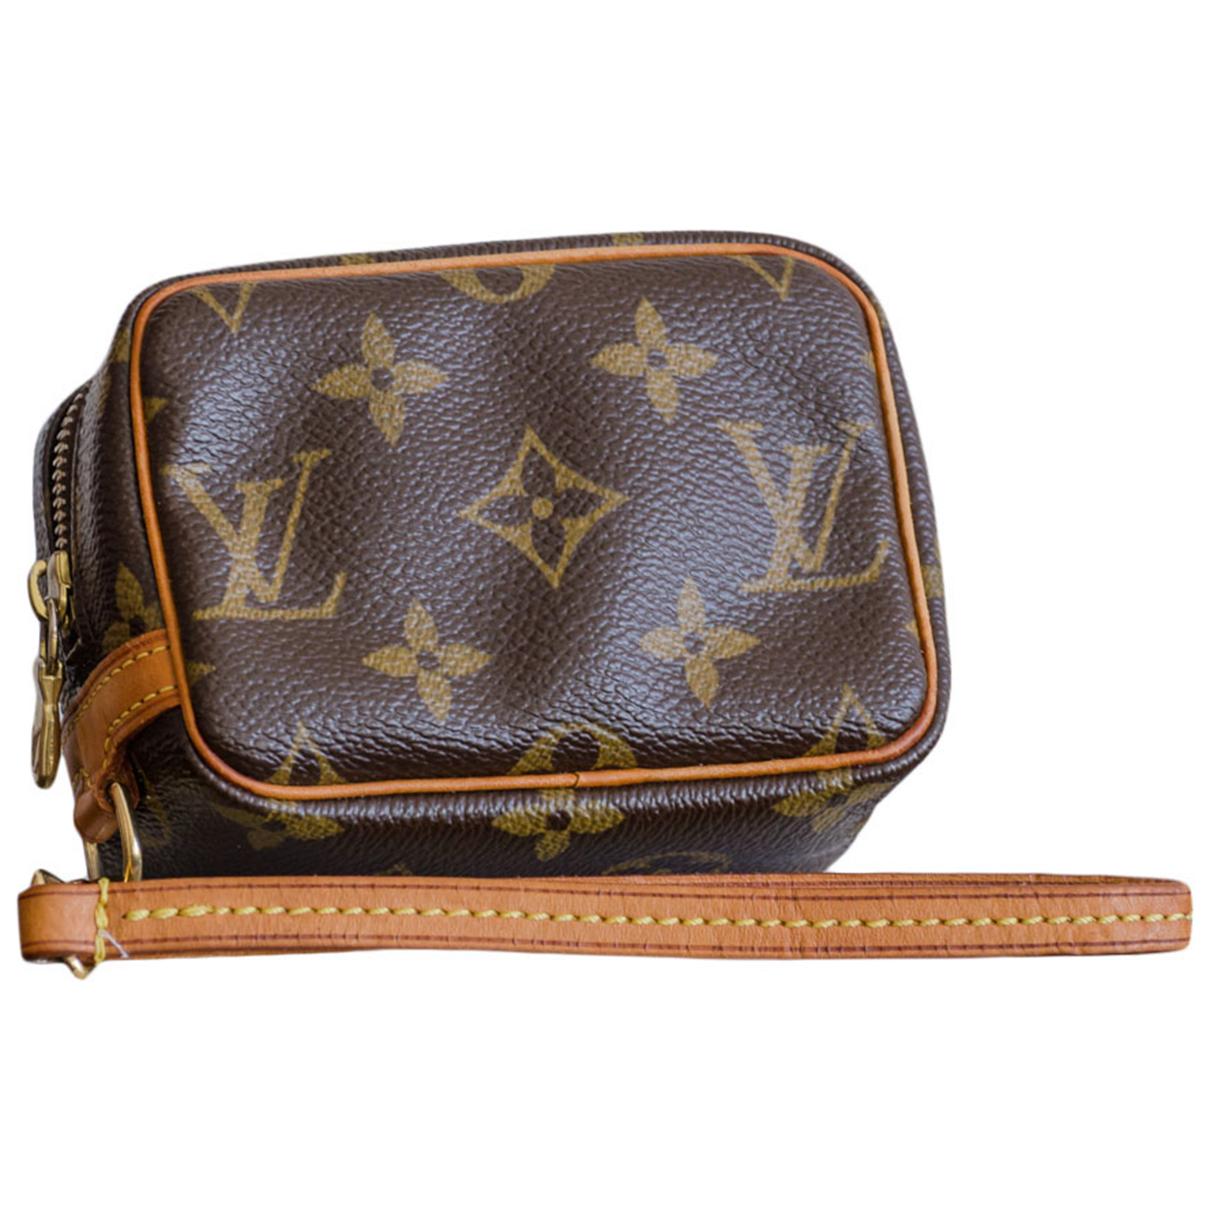 Pochette Wapity de Lona Louis Vuitton